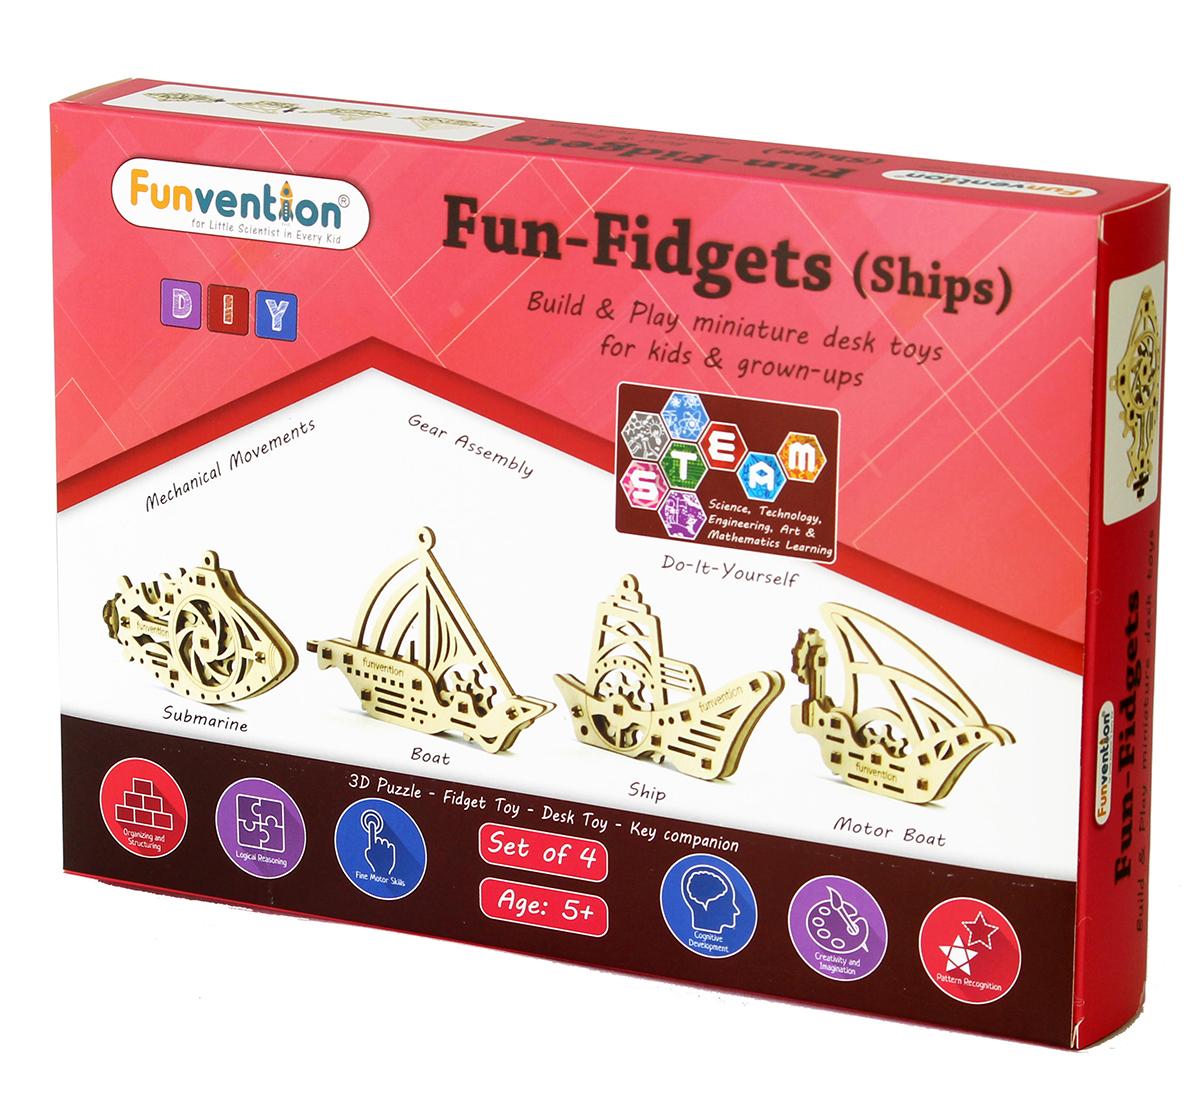 Funvention | Funvention Fun Fidgets - Ships - Set Of 4 Models Stem for Kids Age 5Y+